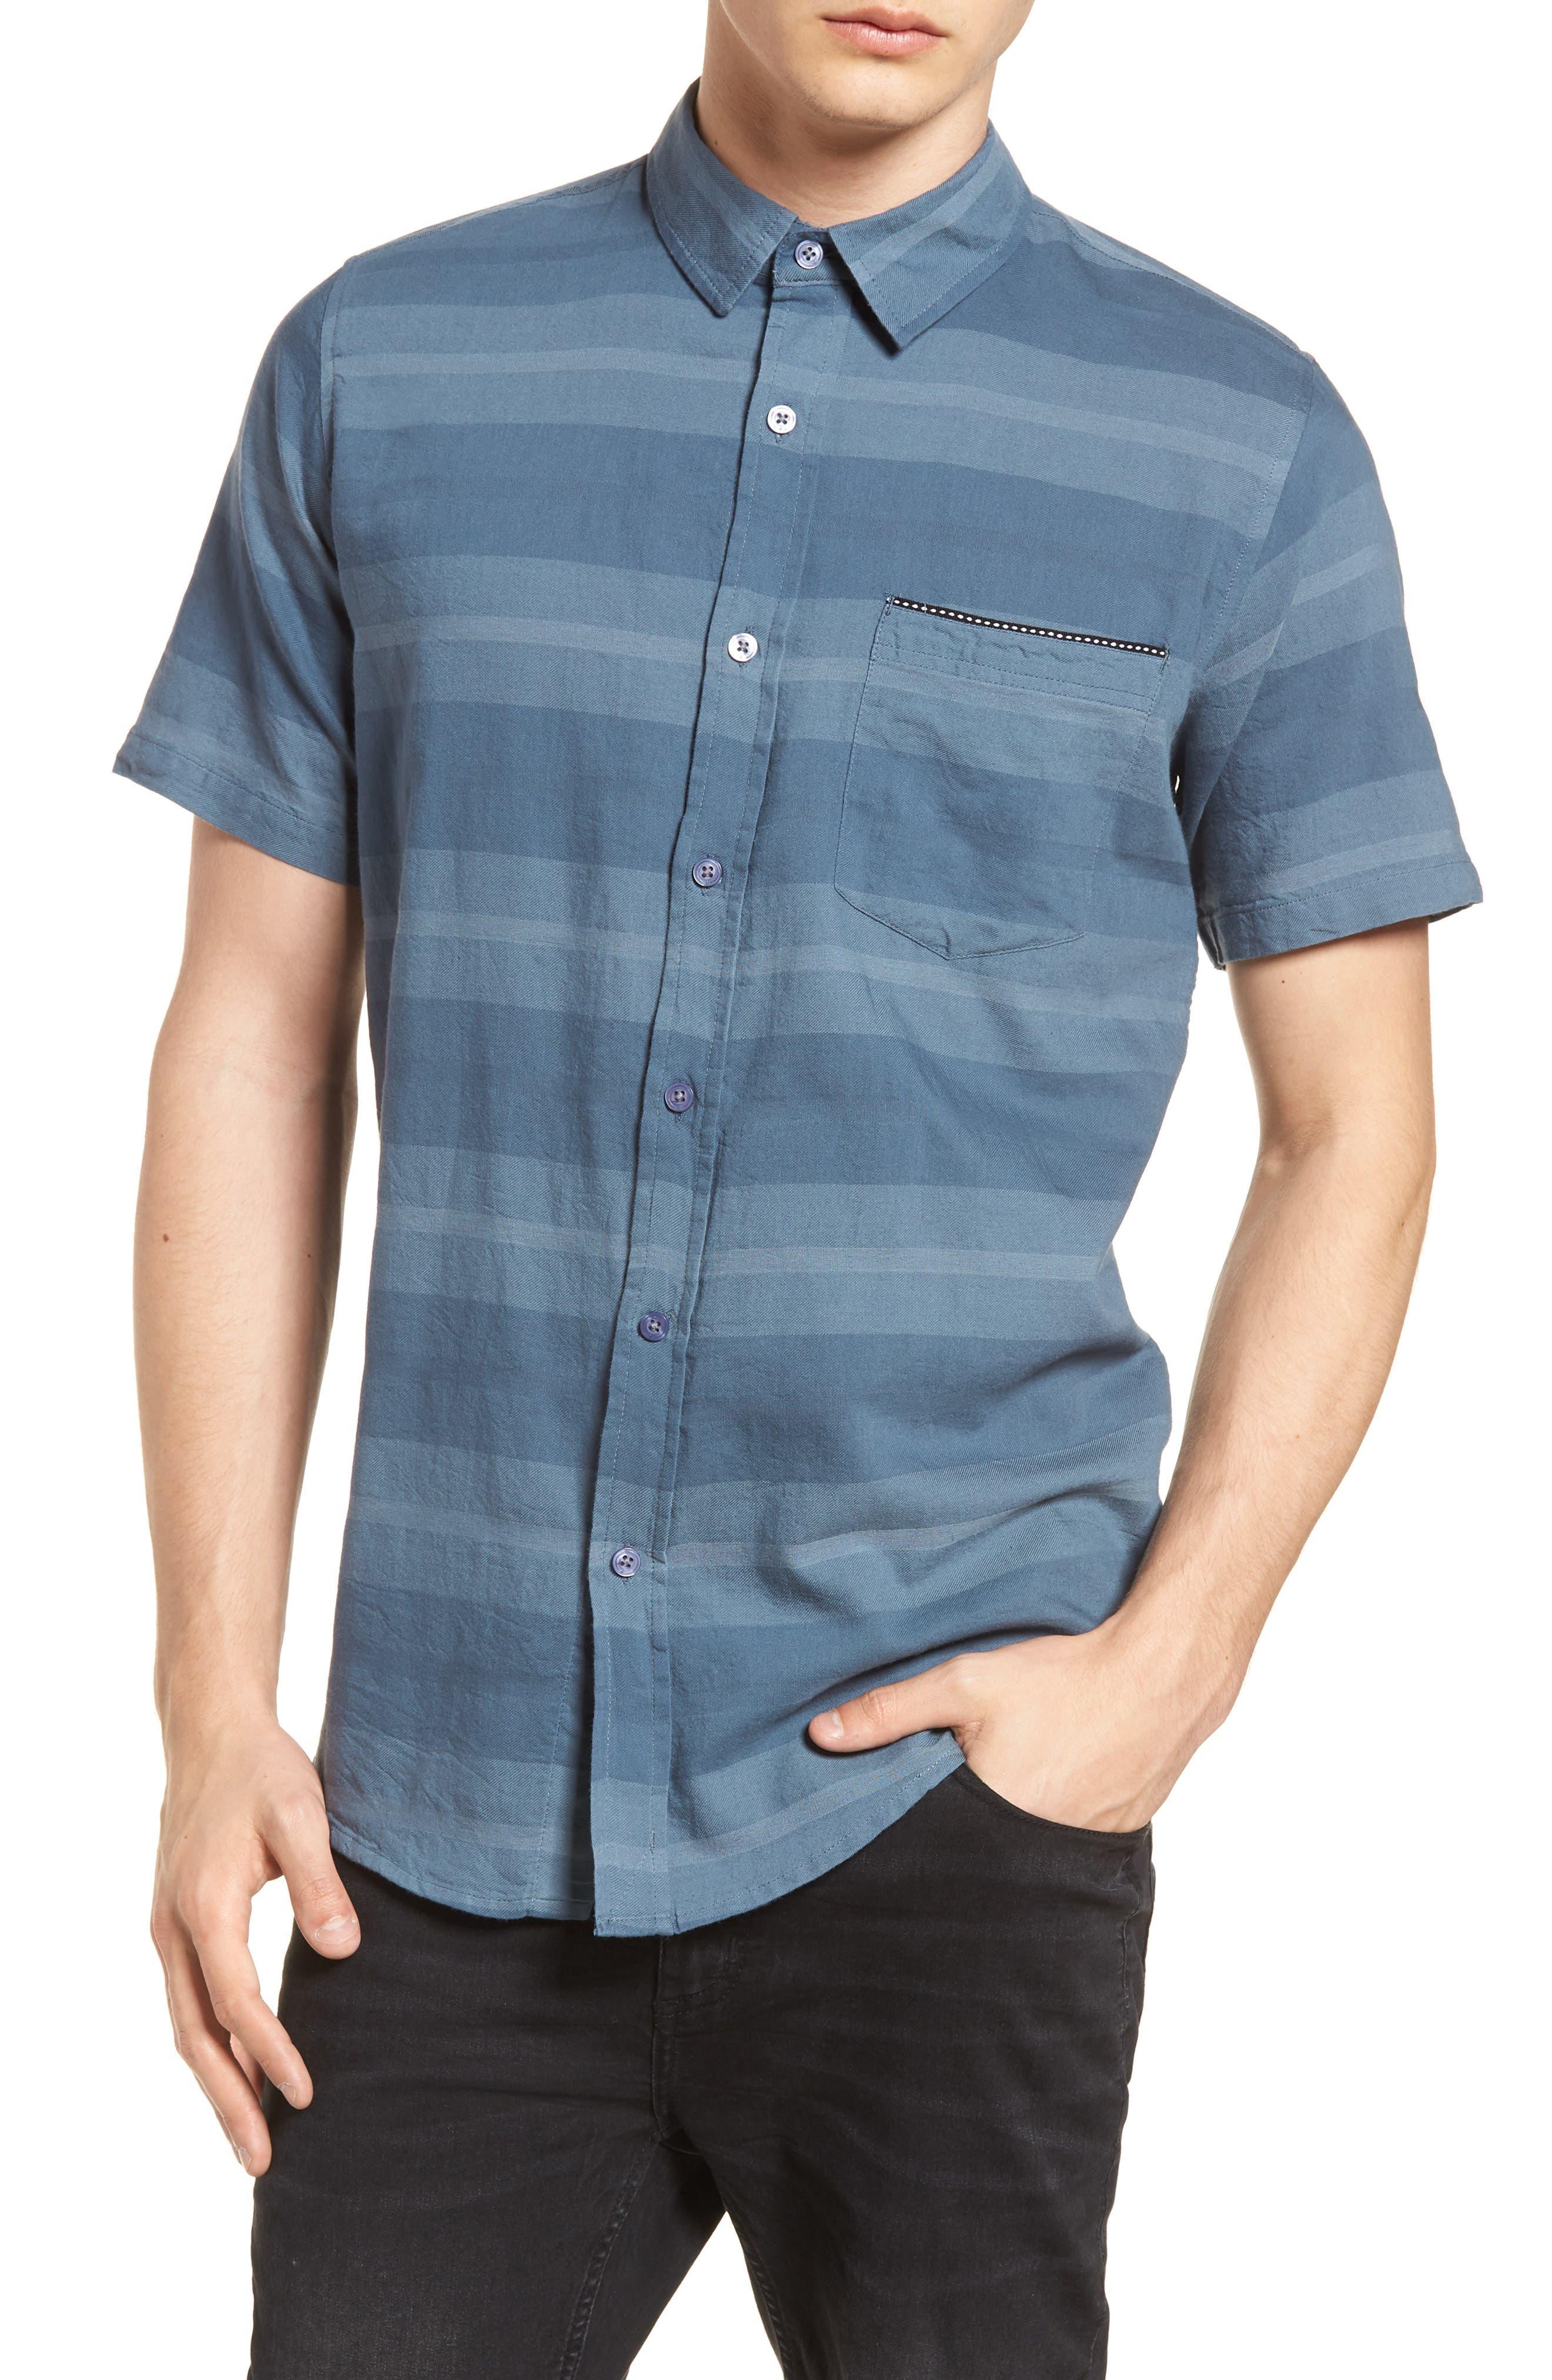 Dobson Woven Shirt,                             Main thumbnail 1, color,                             Storm Blue/Prison Blue Stripe